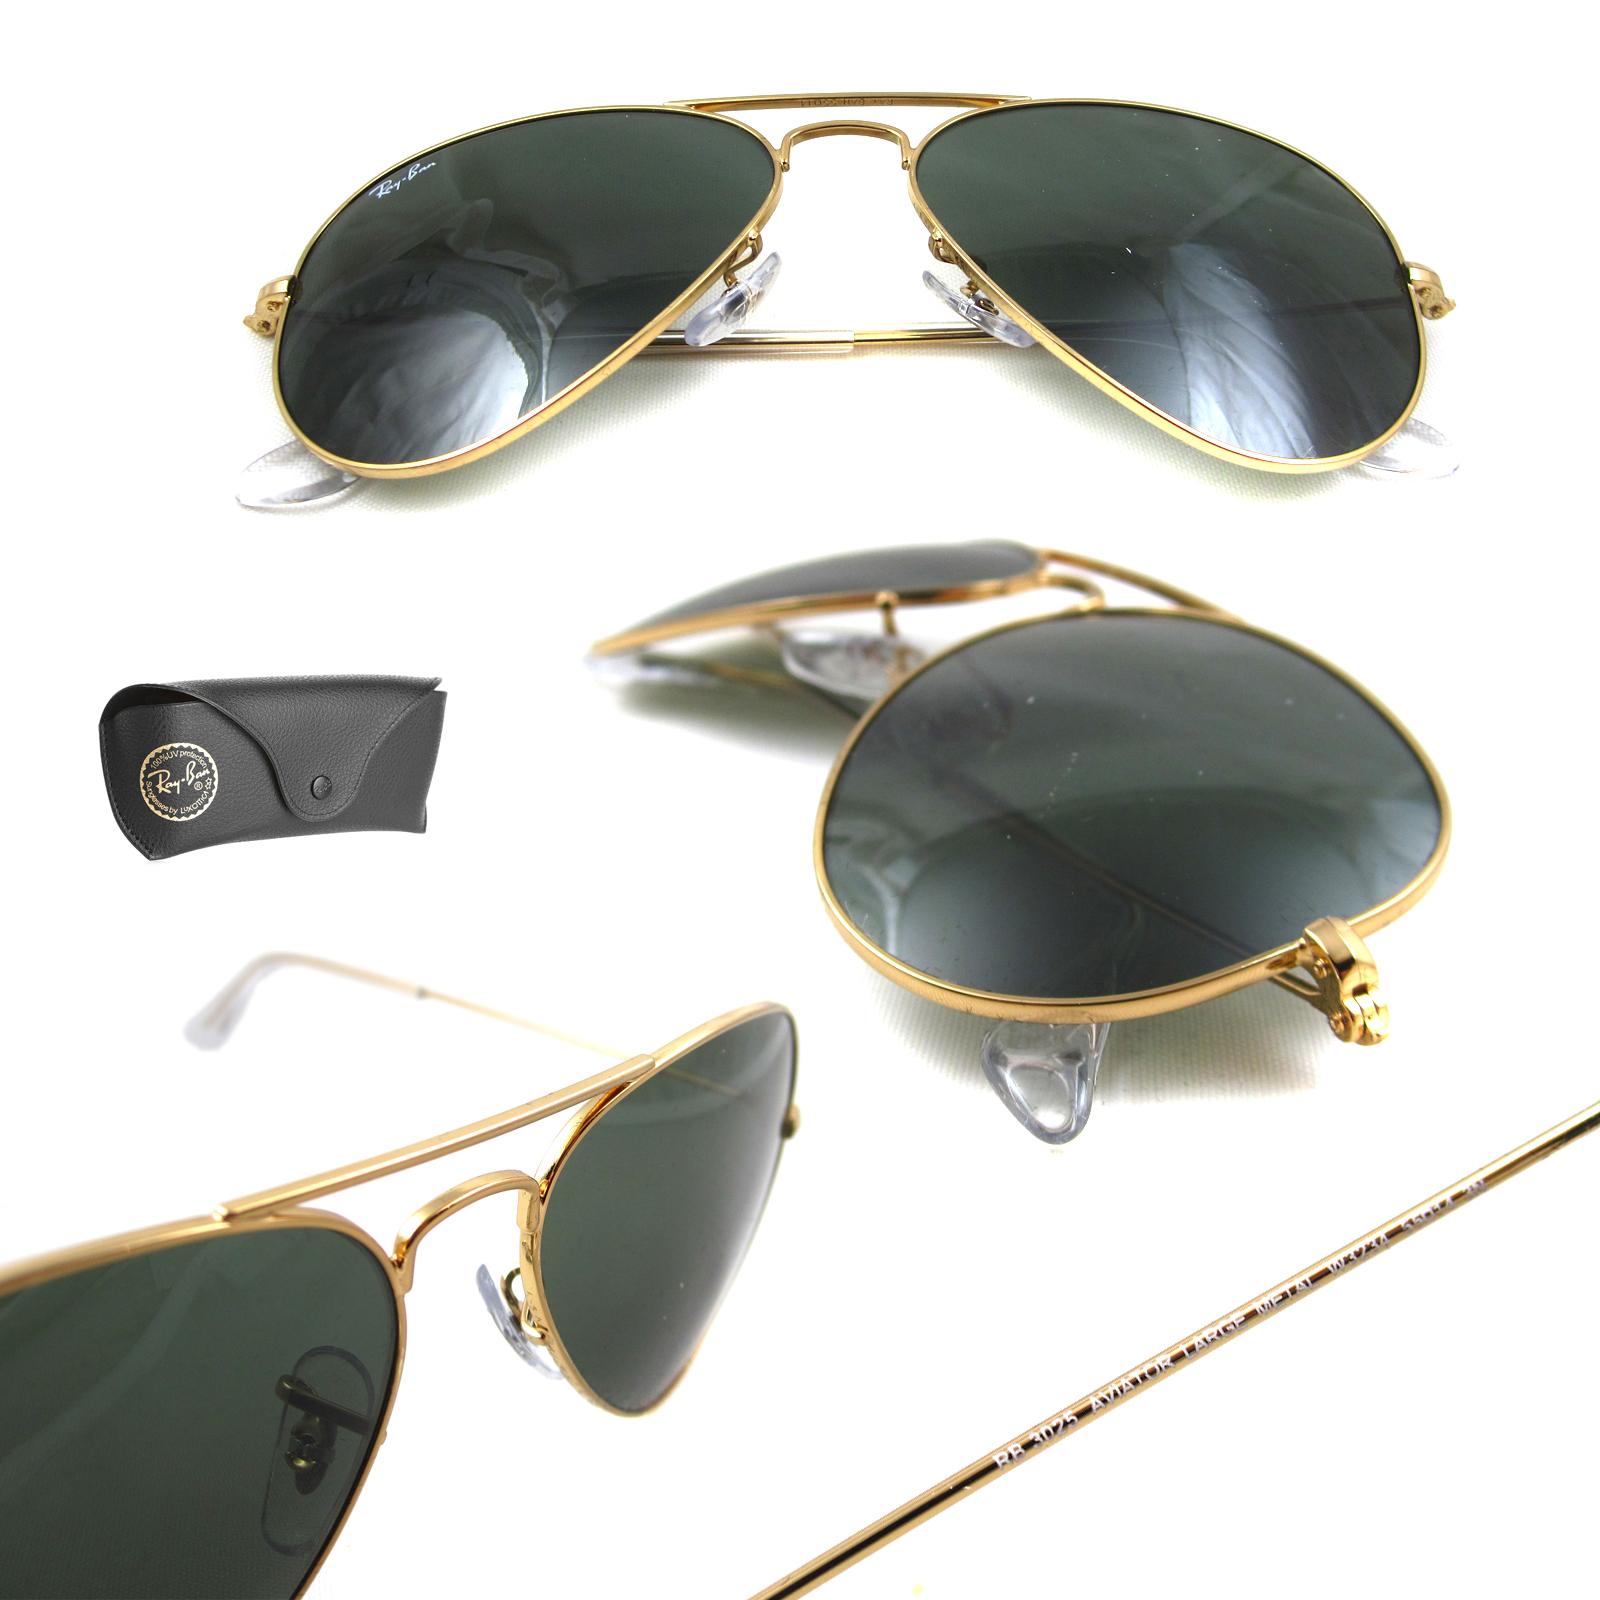 ray ban sonnenbrille aviator 3025 w3234 gold gr n. Black Bedroom Furniture Sets. Home Design Ideas